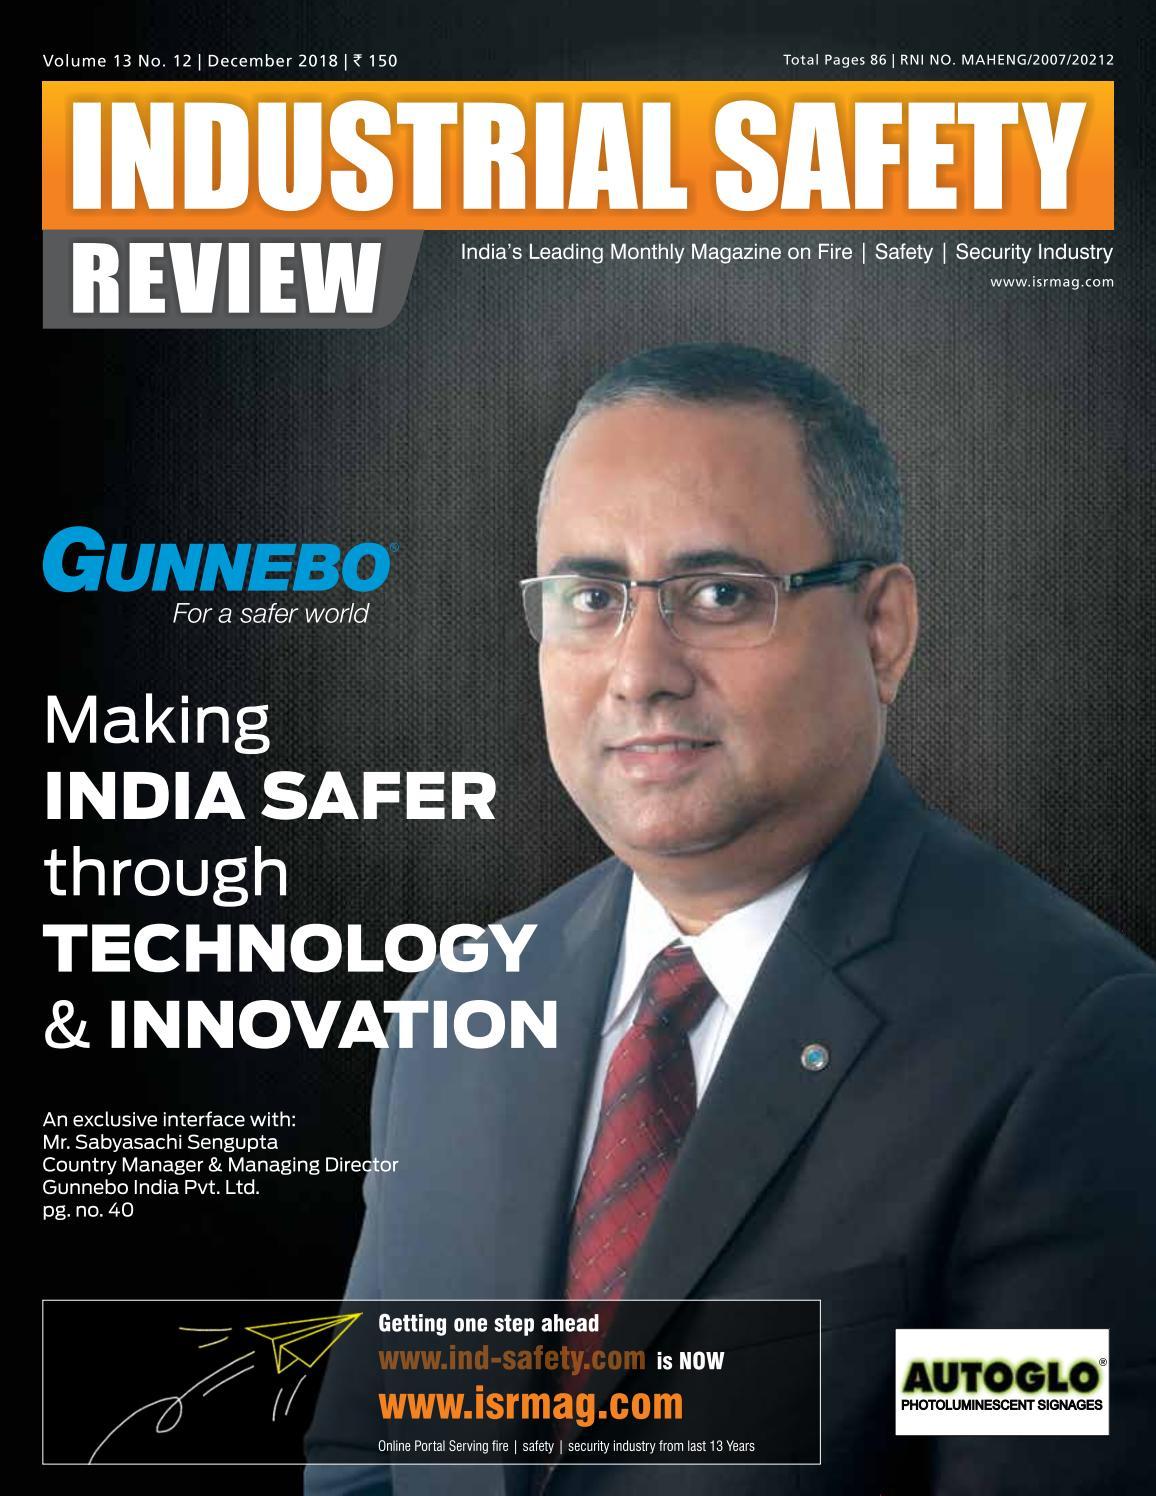 INDUSTRIAL SAFETY - DECEMBER 2018 by Divya Media